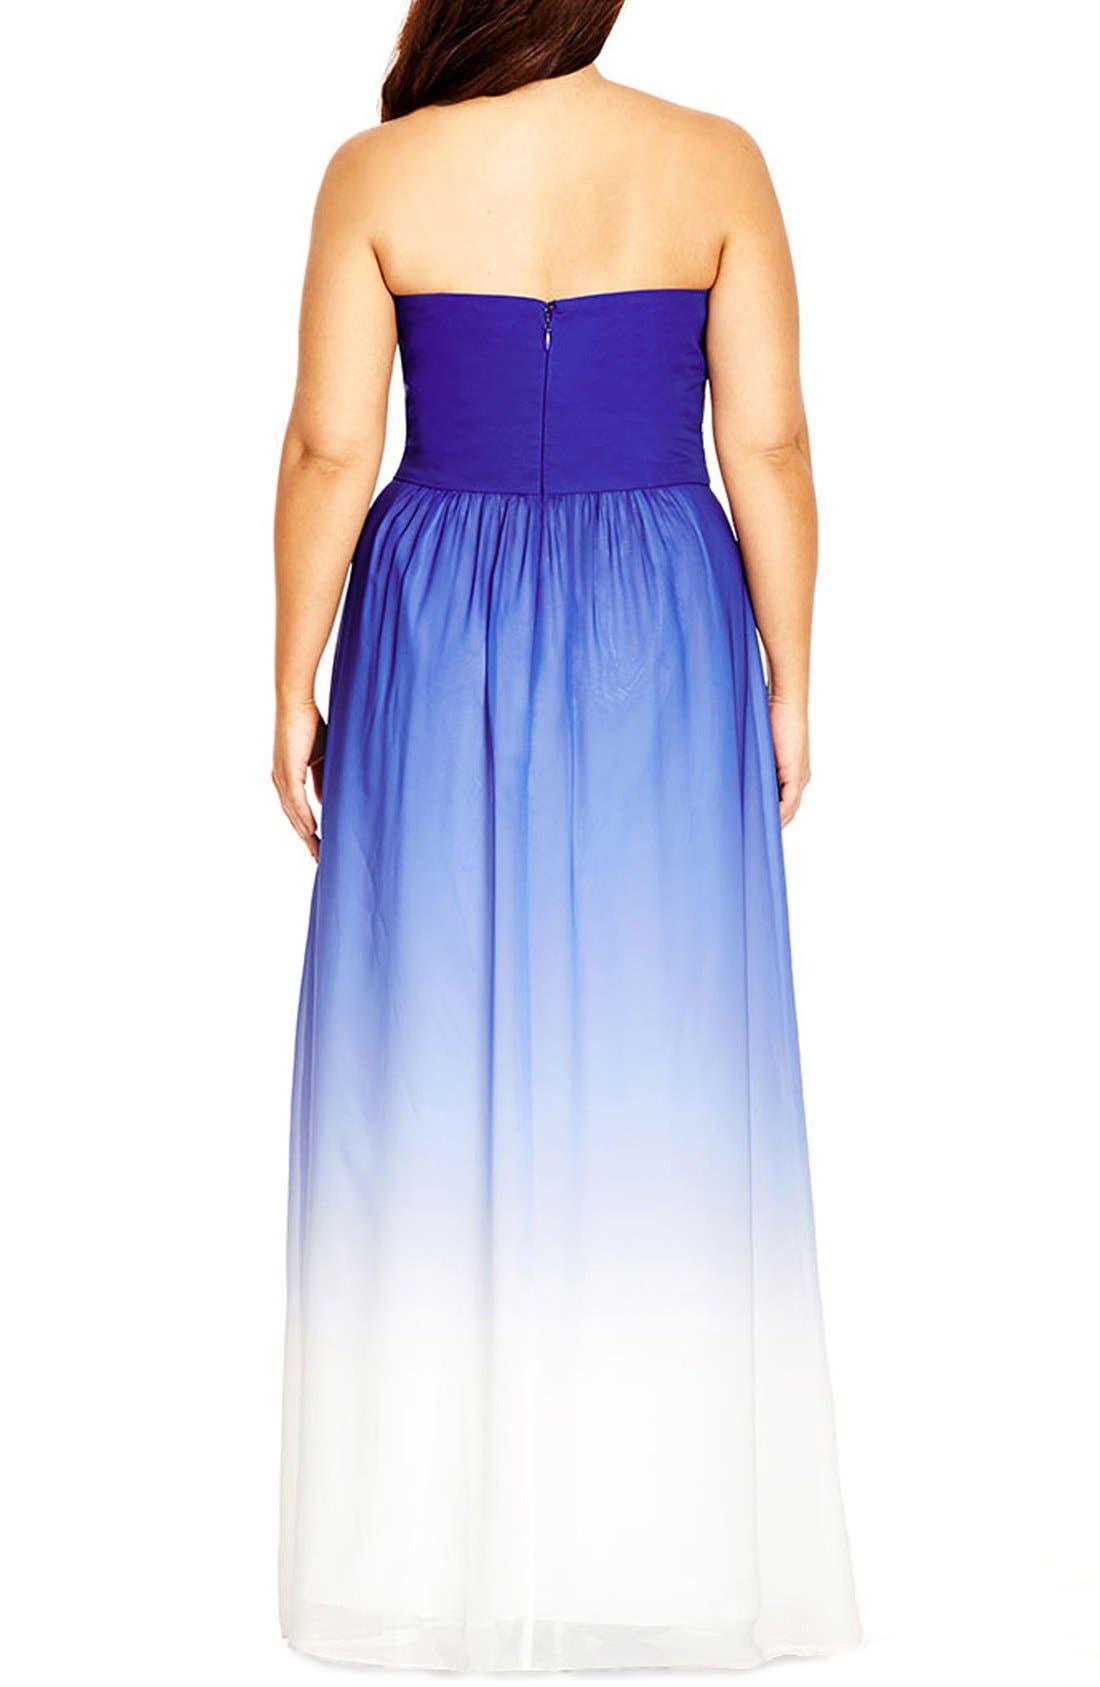 Alternate Image 2  - City Chic 'Enchanted' Embellished Strapless Ombré Maxi Dress (Plus Size)